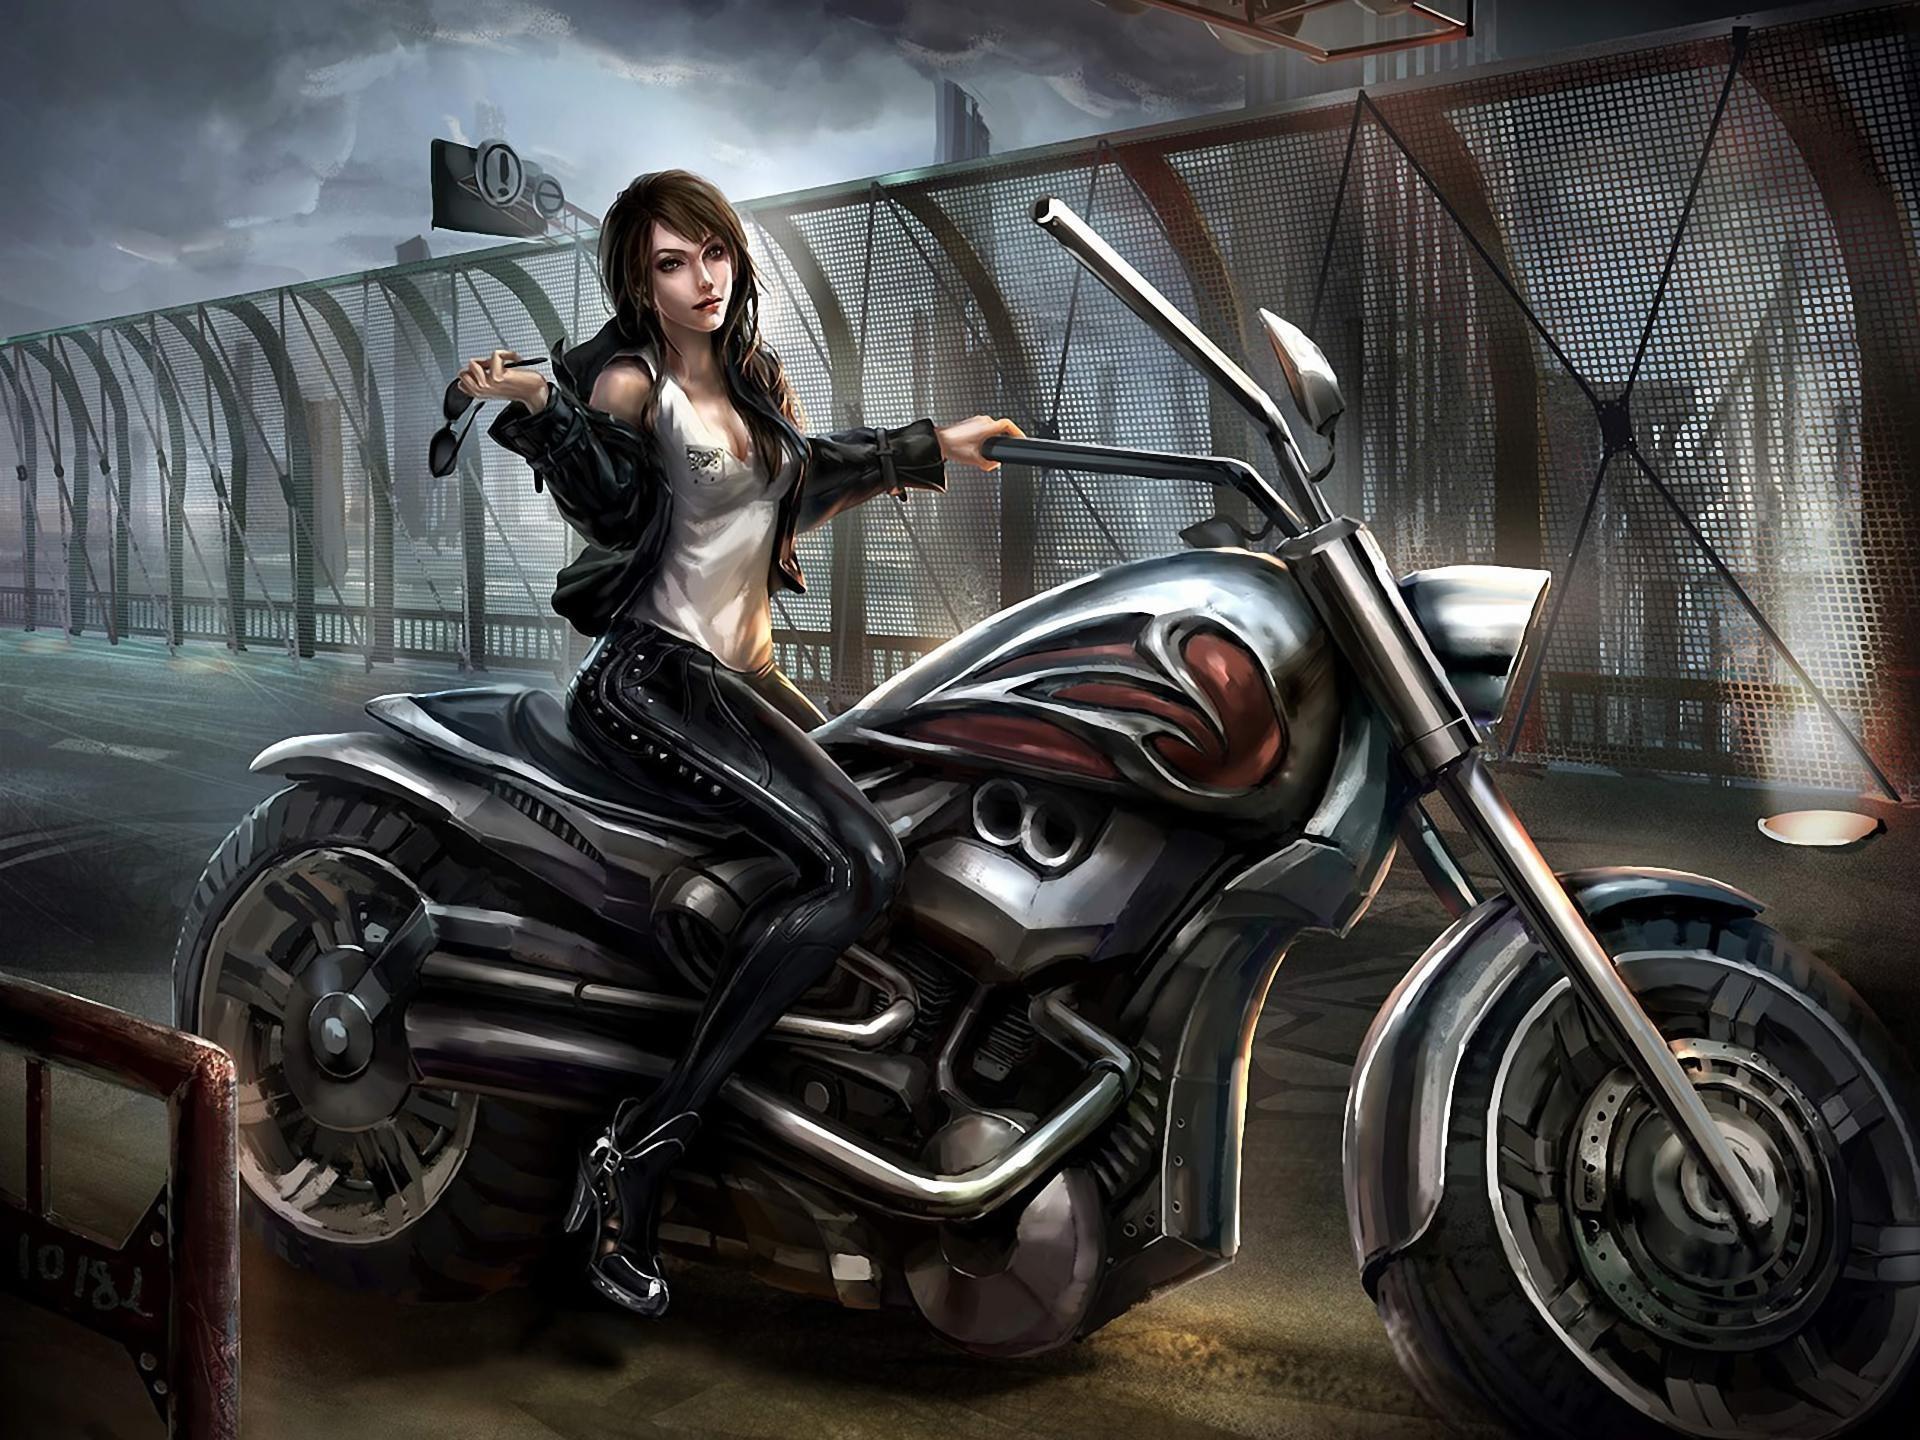 HD Motorcycle Girl Wallpaper. Download Motorcycle Girl Desktop  Backgrounds,Photos in HD Widescreen High